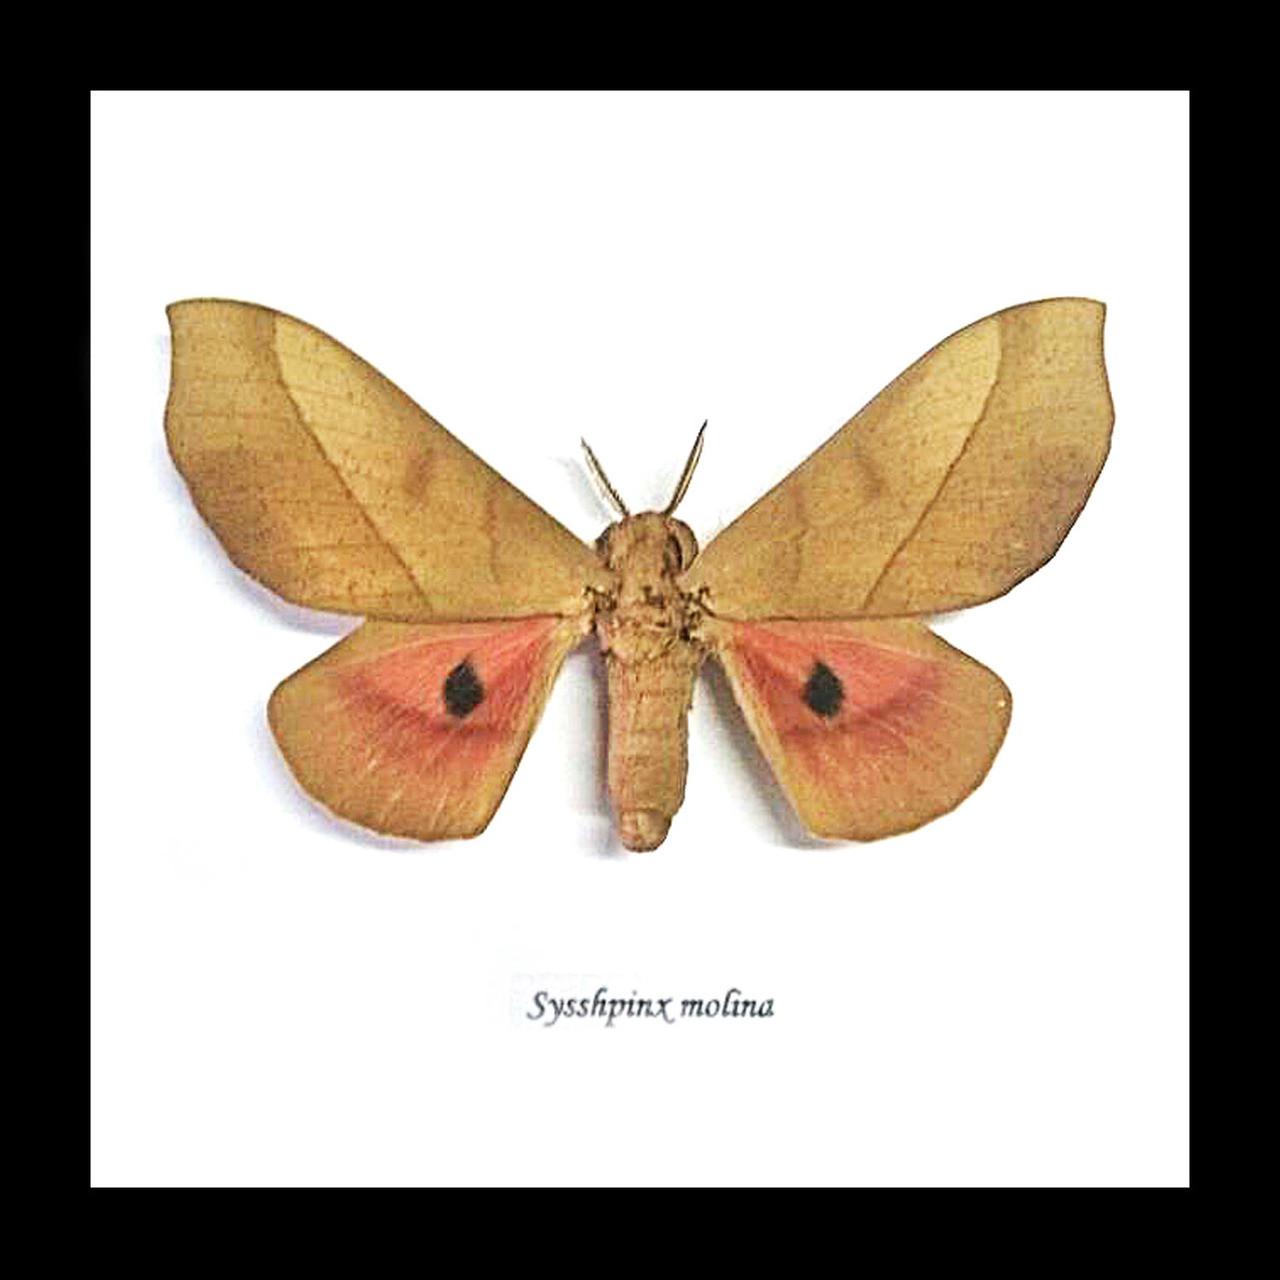 Sysshpinx molina - Bits and Bugs